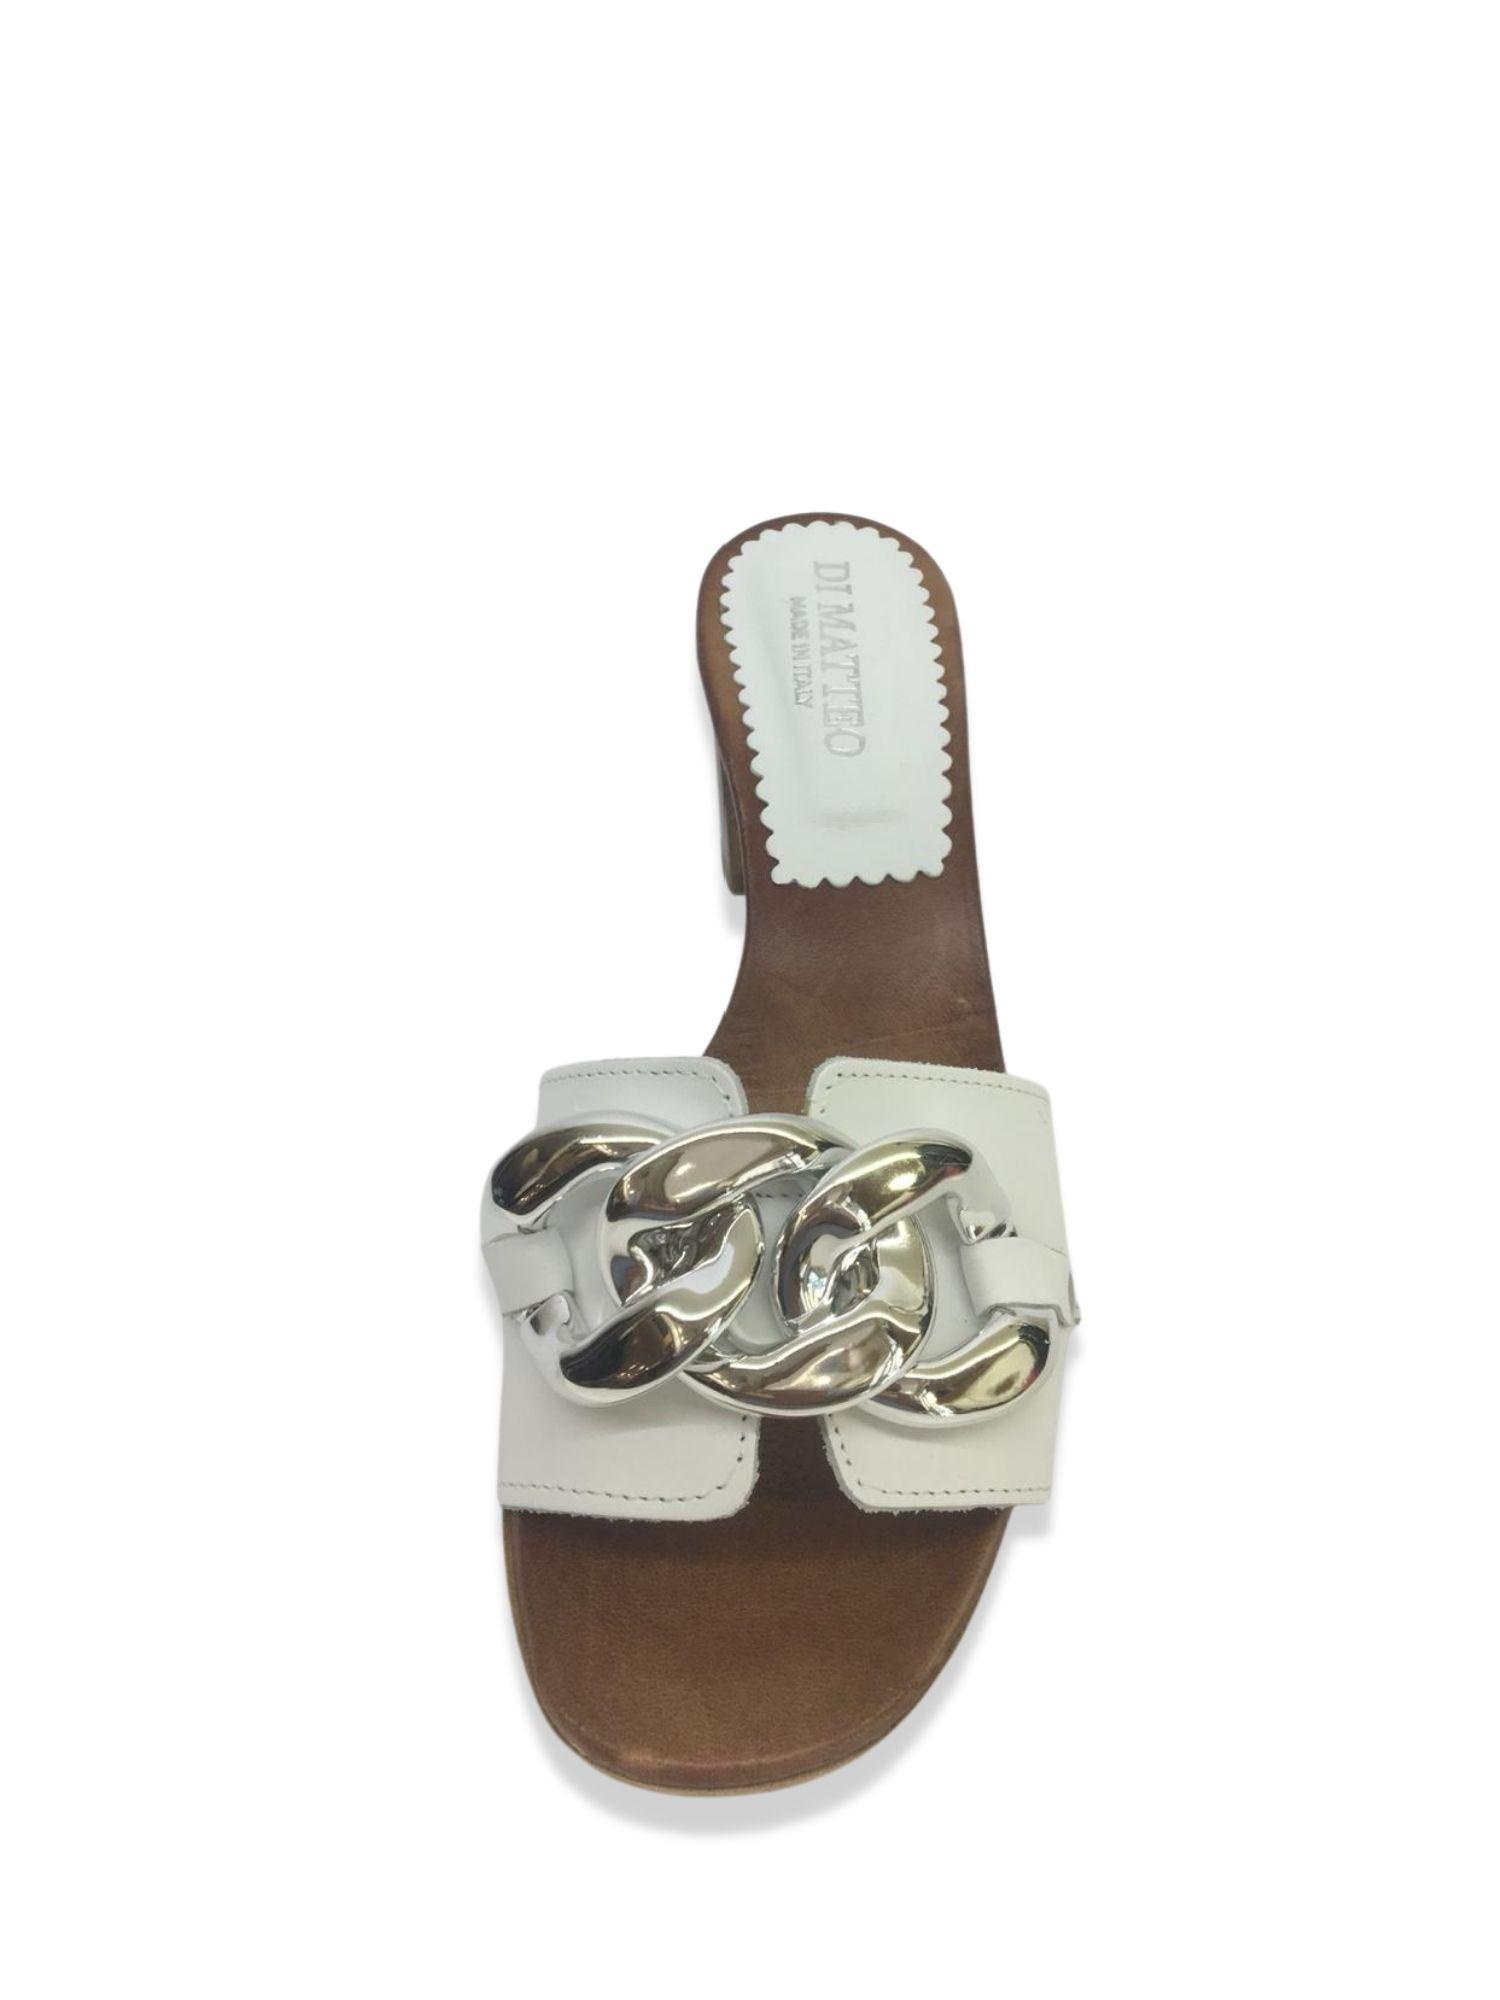 Sandalo Scalzato Made in Italy 500 Bianco alto 1